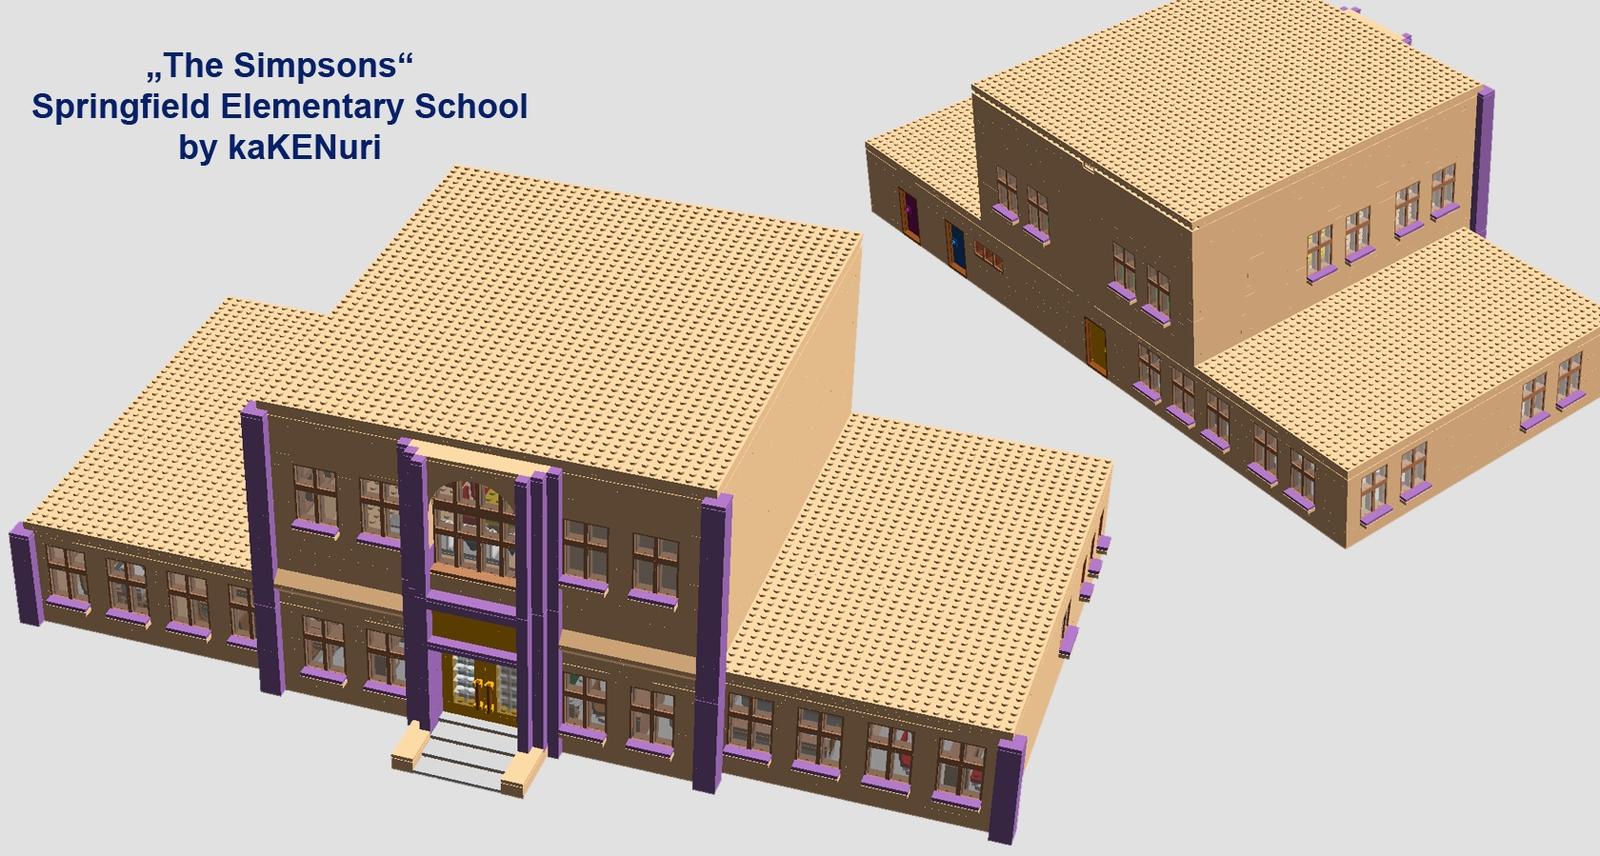 lego ideas - product ideas - simpsons© springfield elementary school